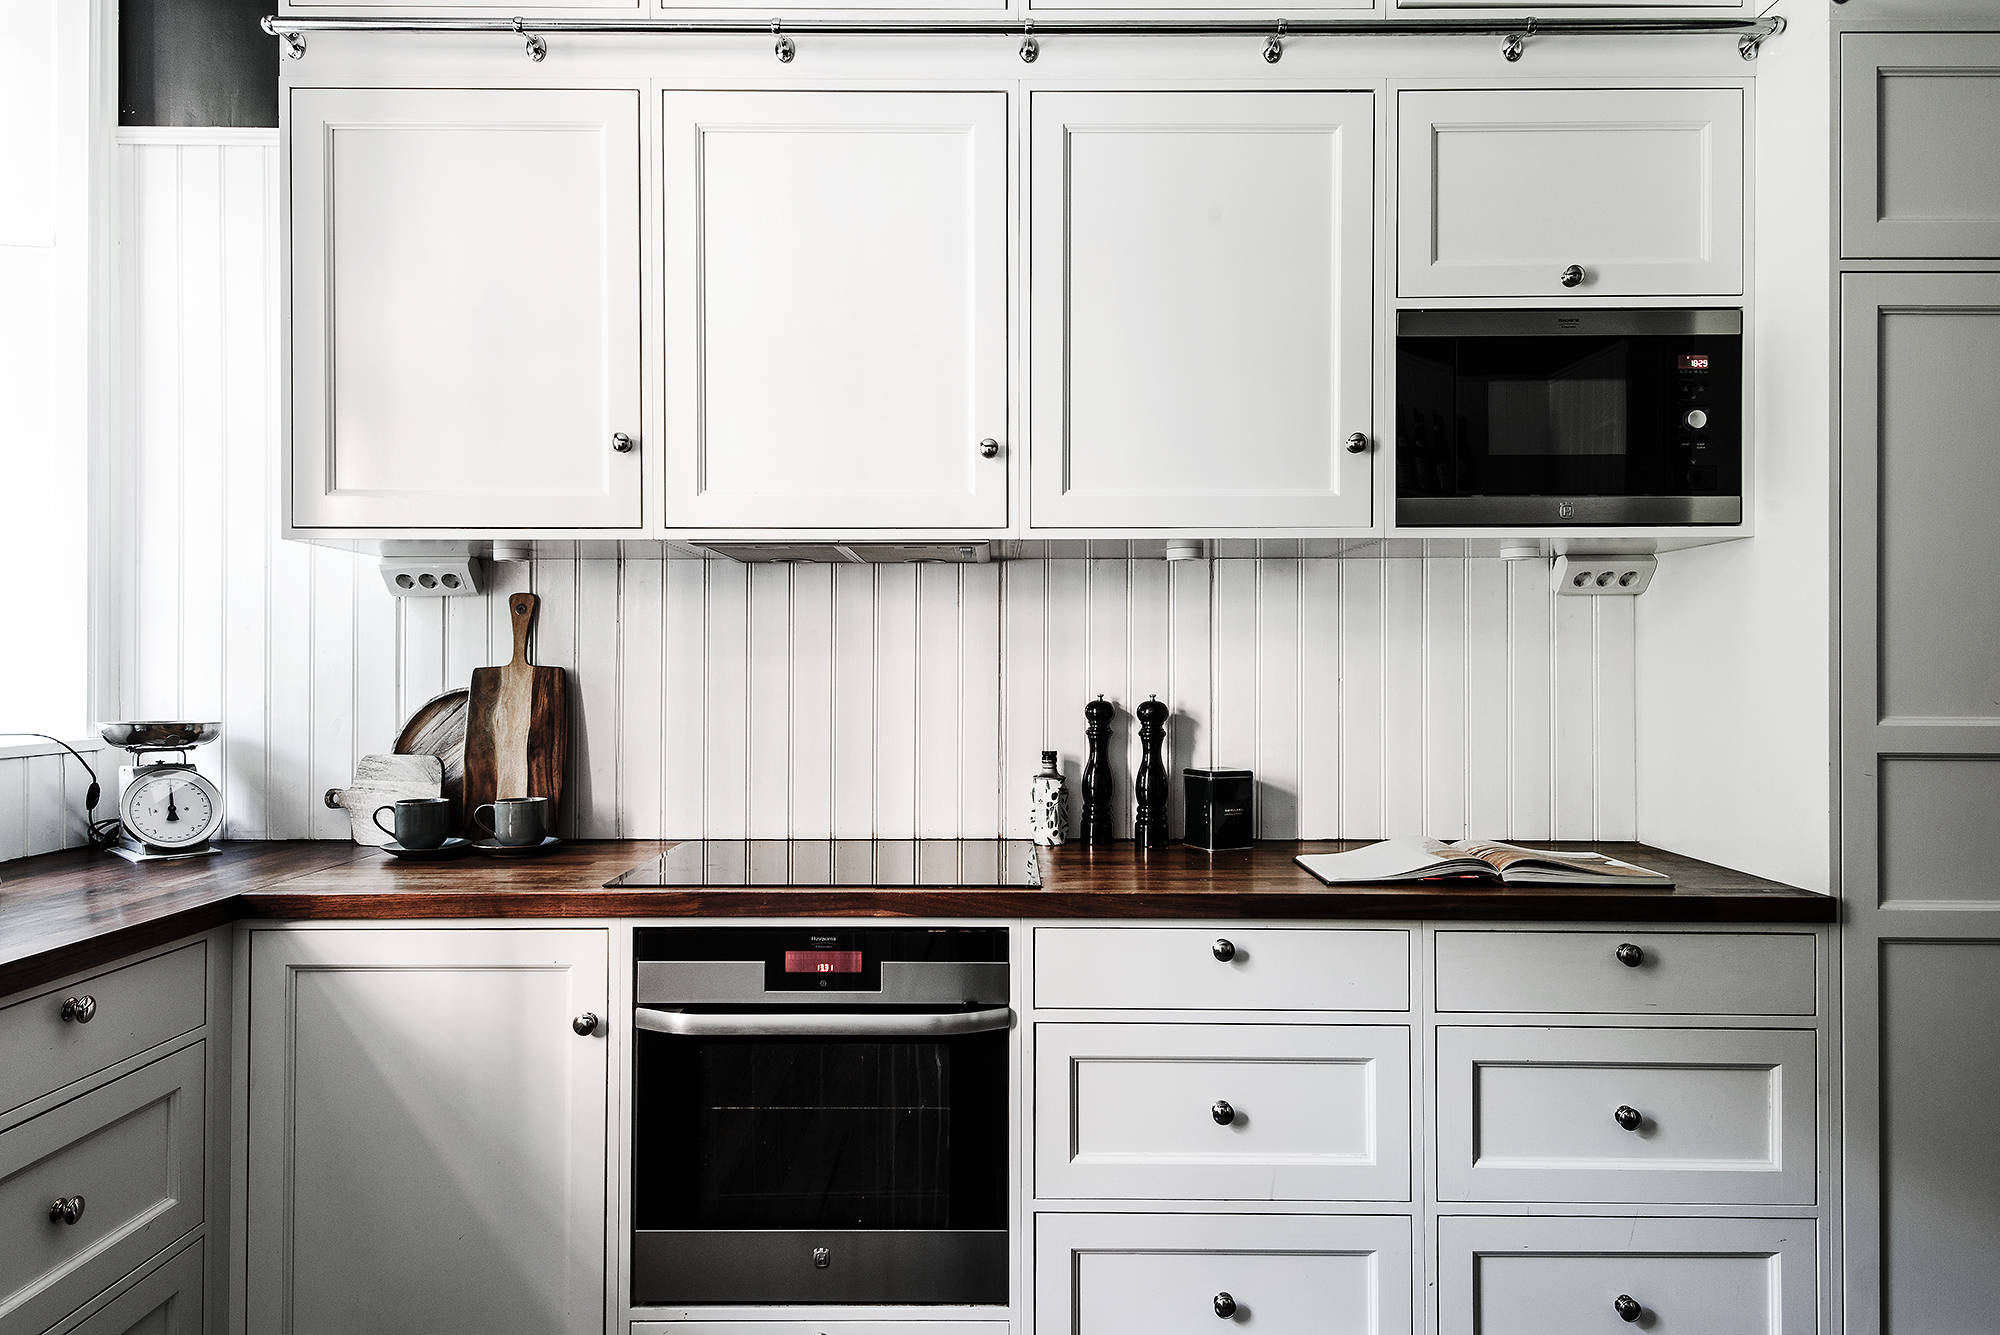 кухня белые фасады плита встроенная вытяжка